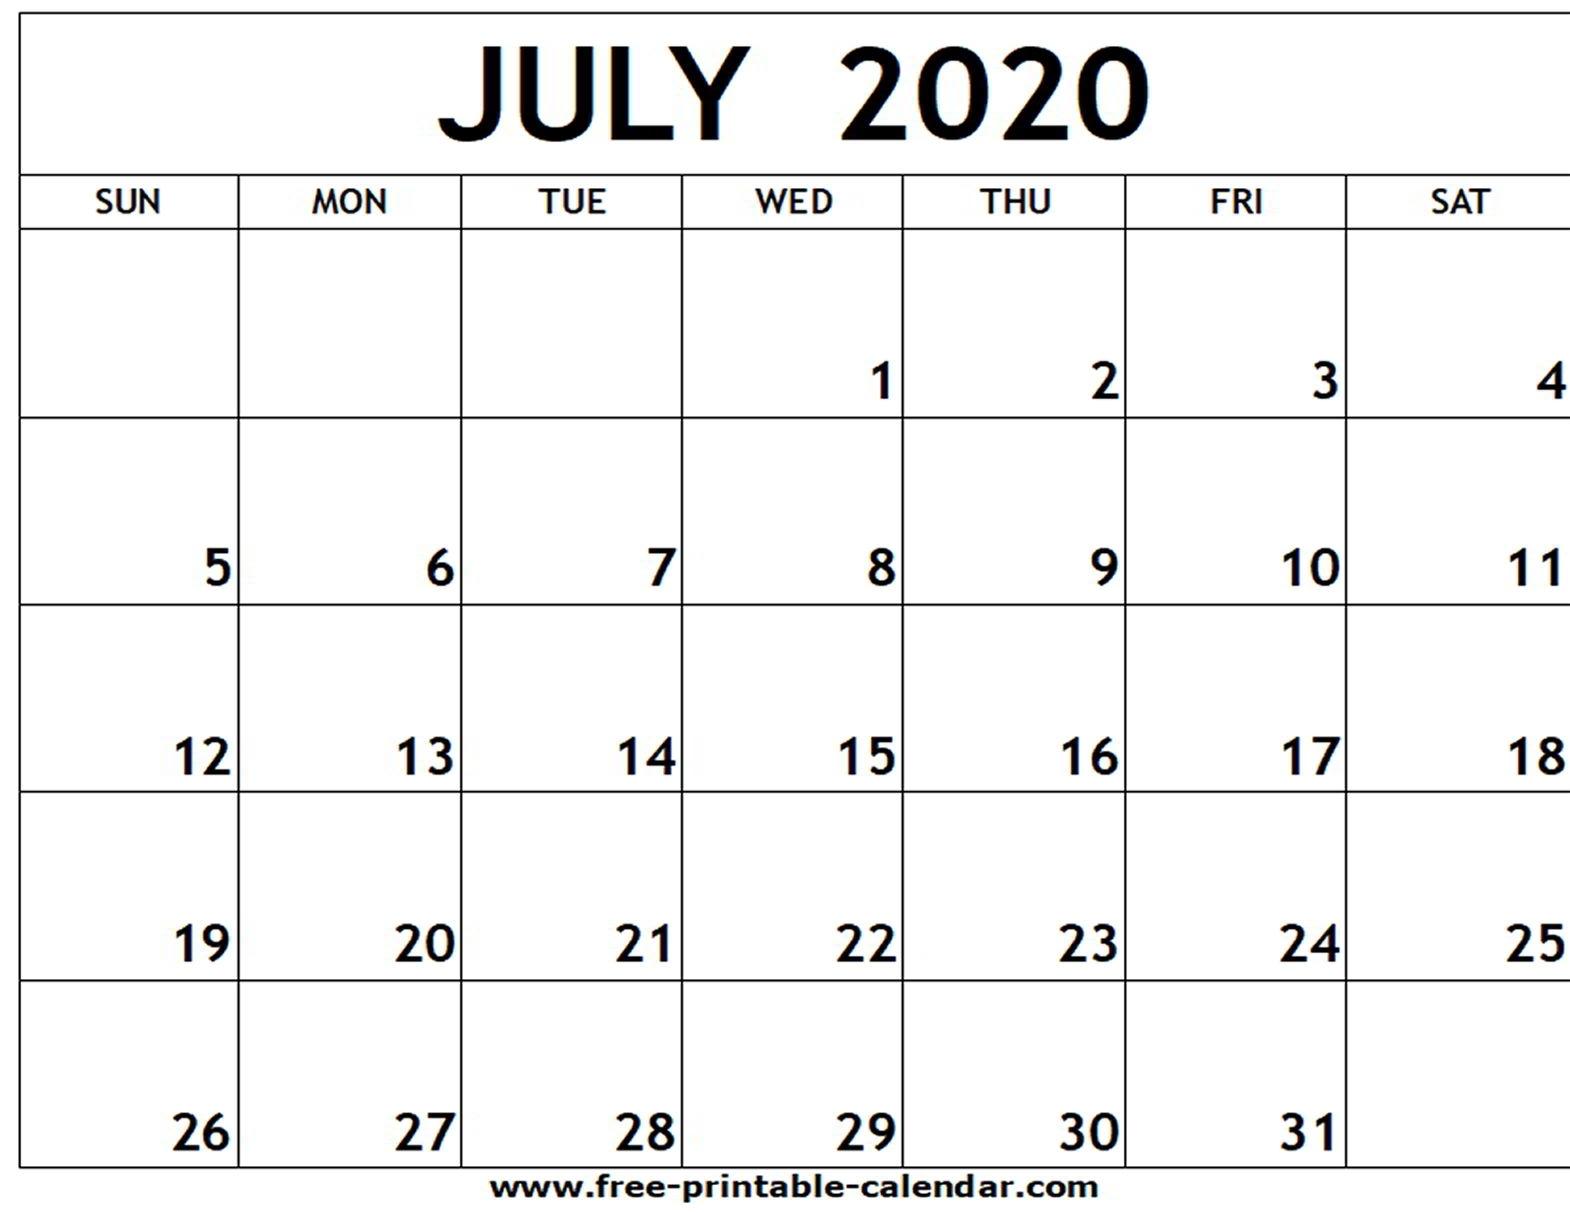 July 2020 Printable Calendar - Free-Printable-Calendar